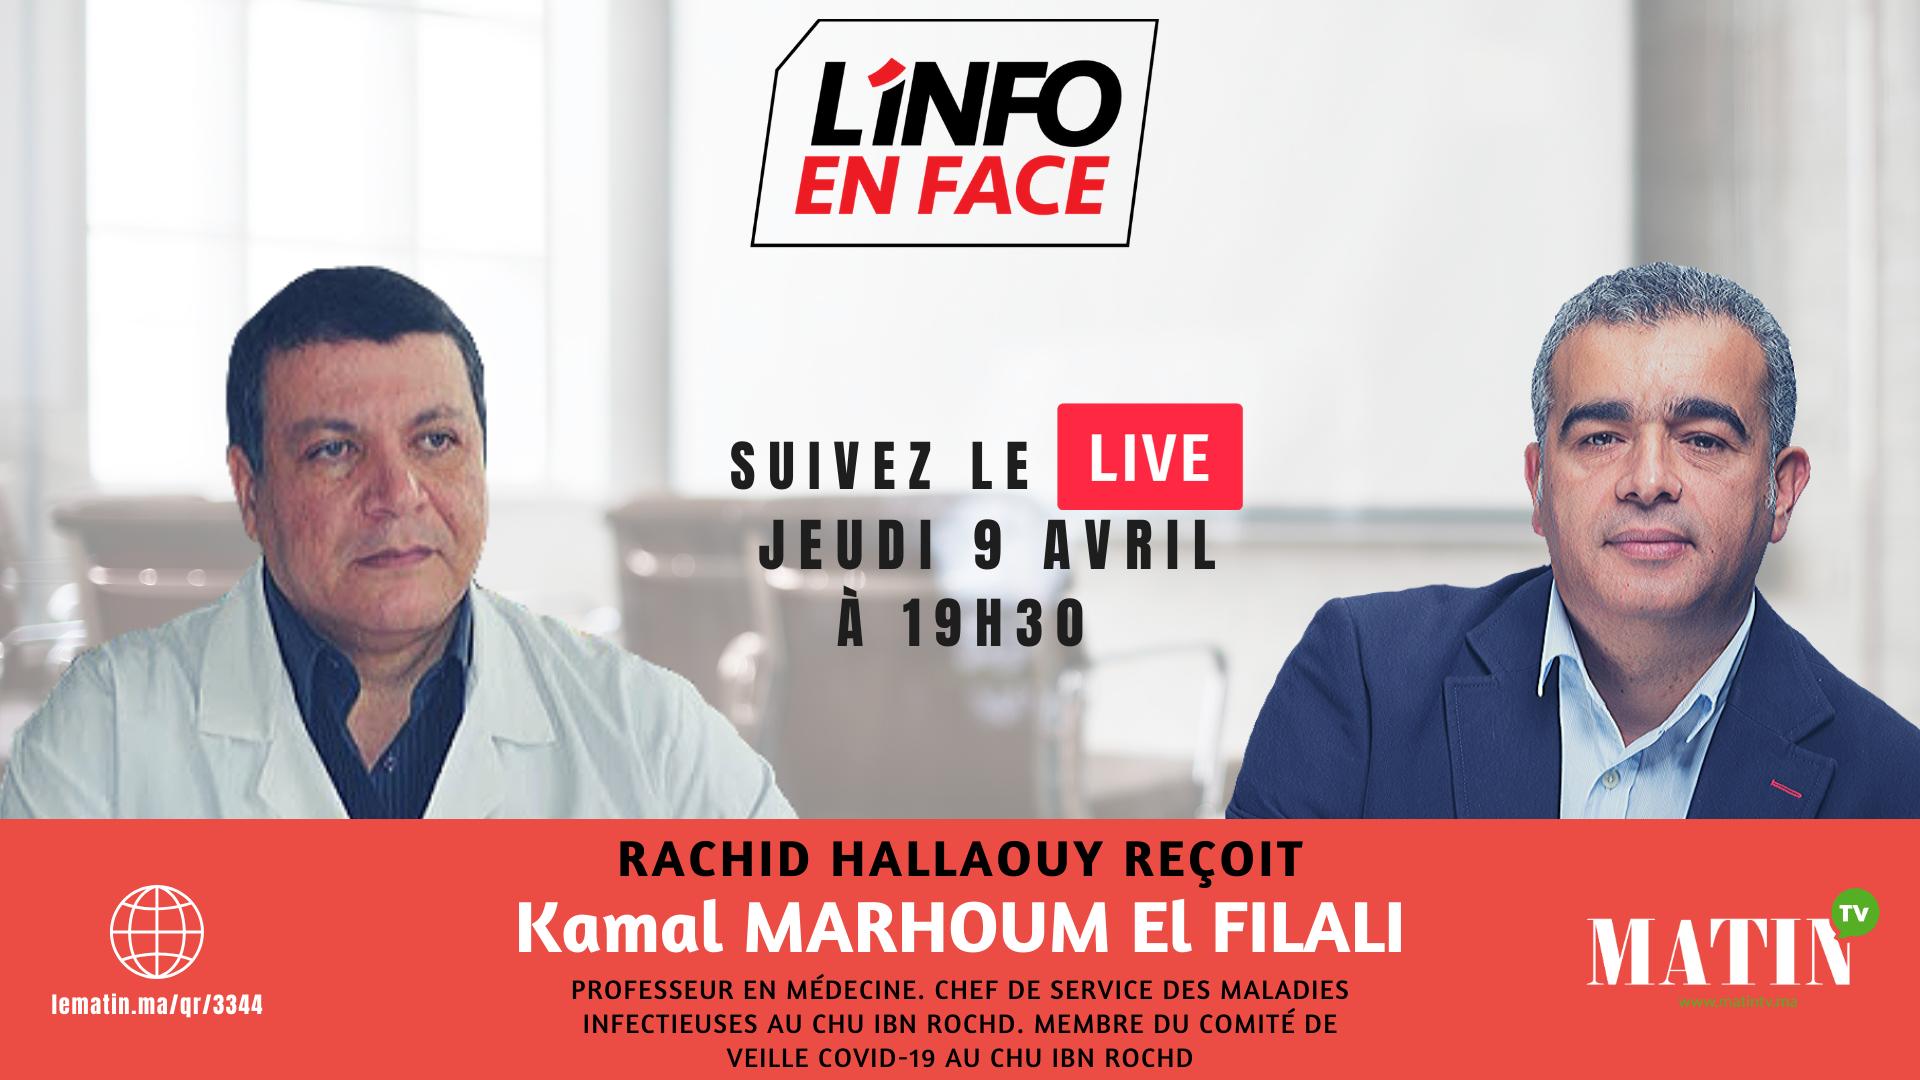 Live : L'Info en Face avec Kamal Marhoum El Filali